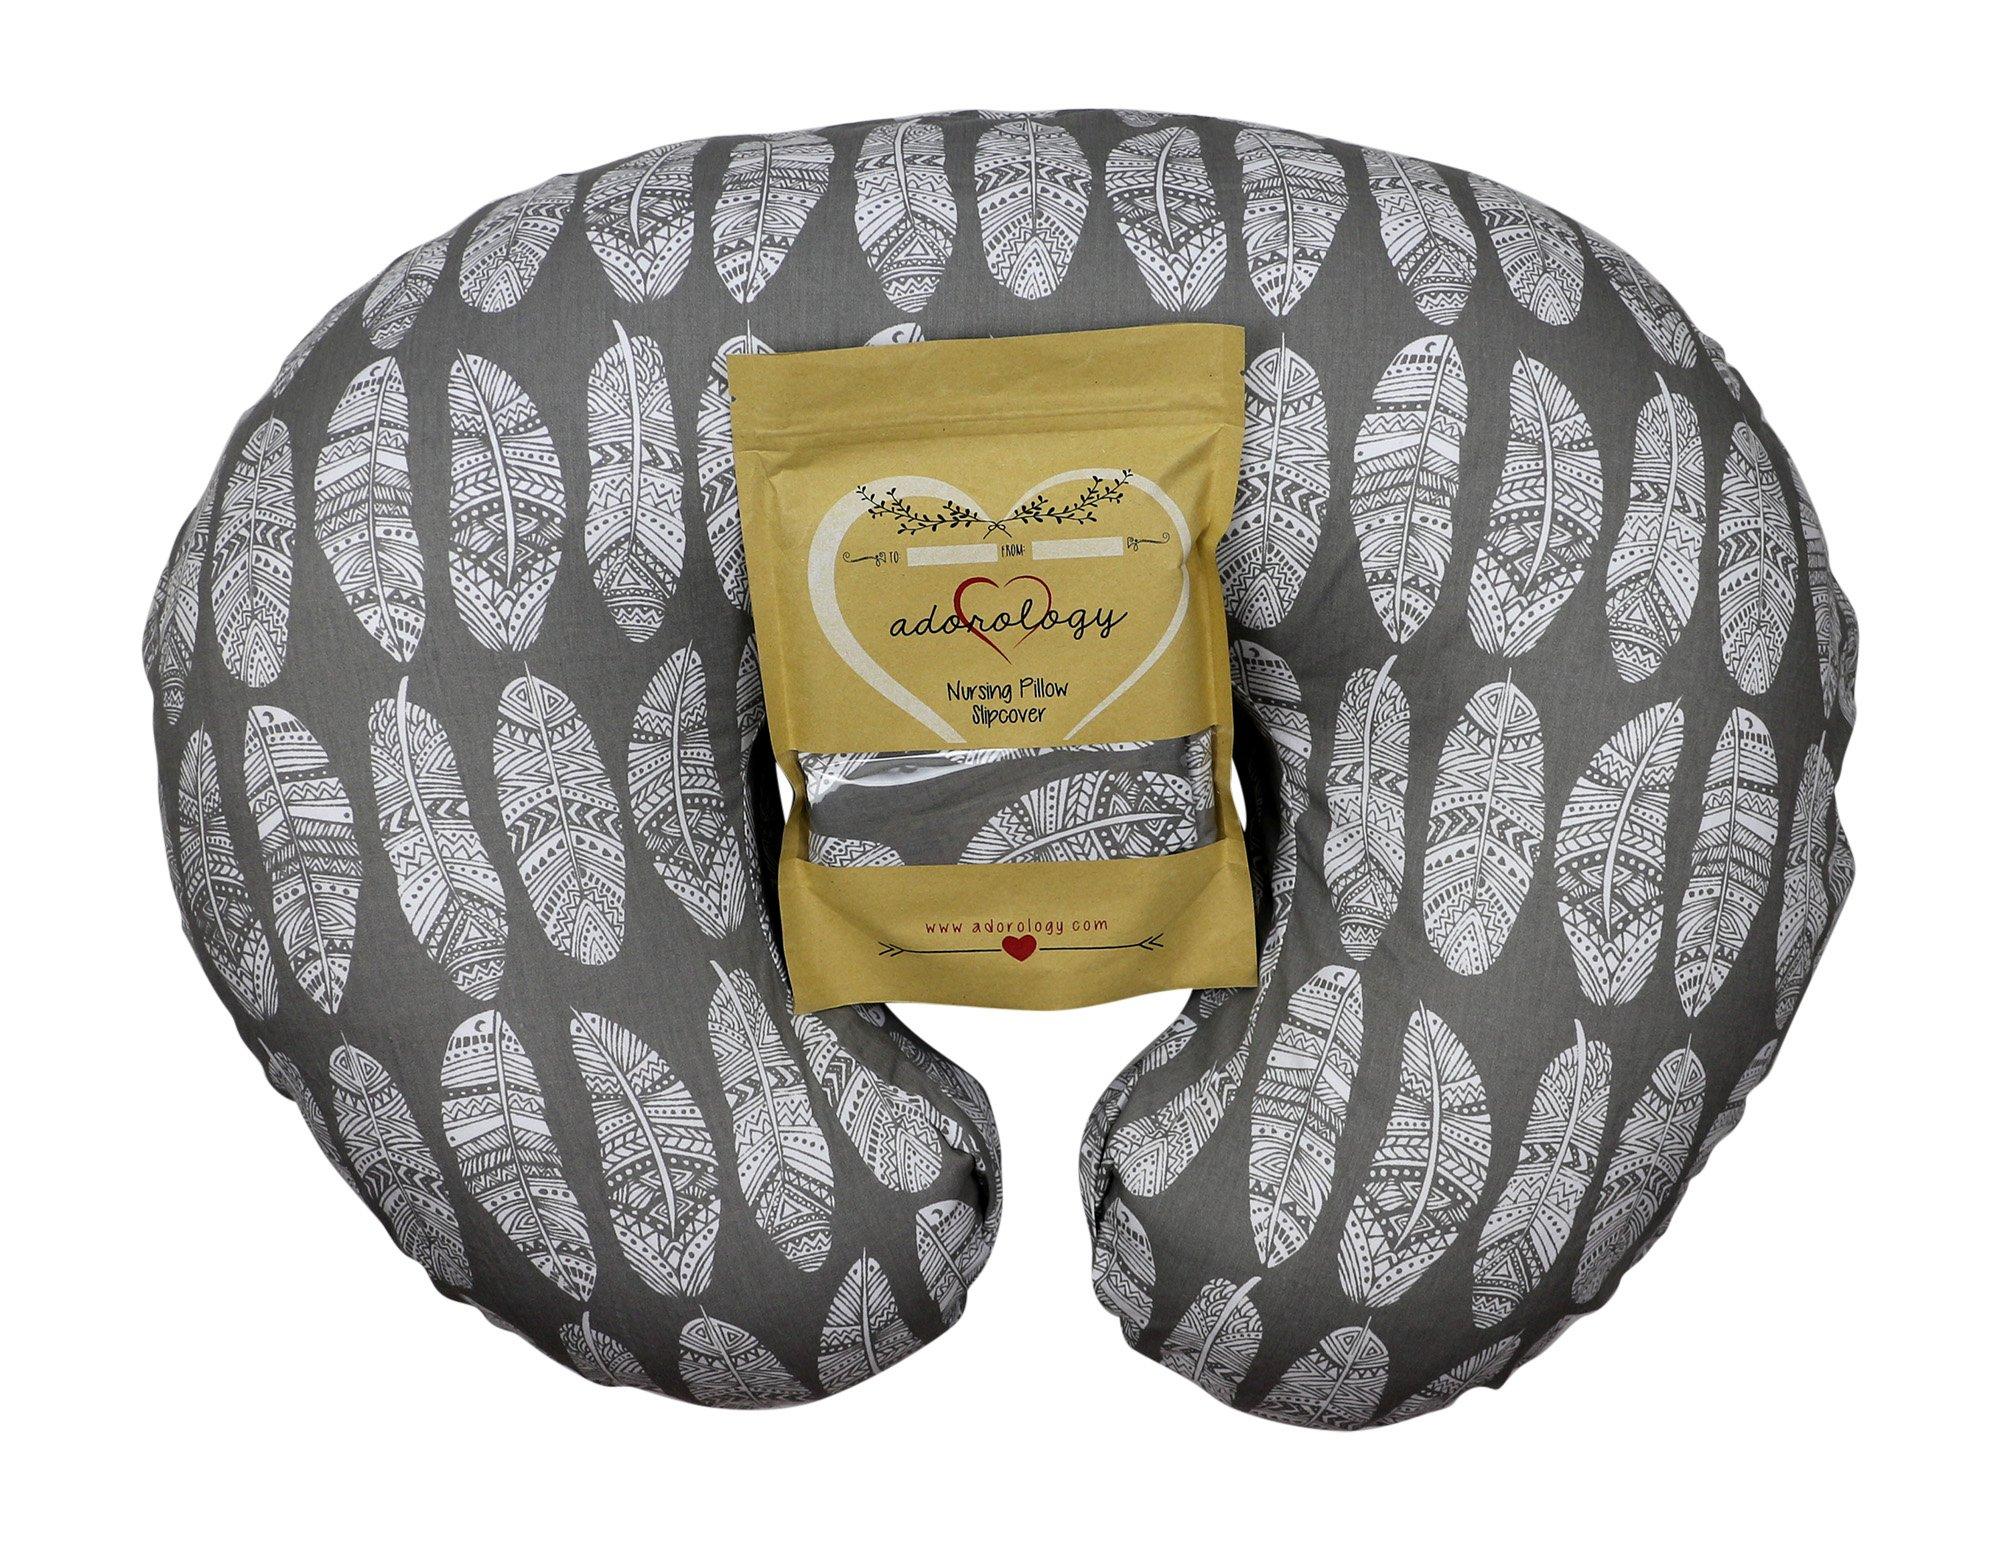 Nursing Pillow Slipcover Gray Feathers Design Maternity Breastfeeding Newborn Infant Feeding Cushion Cover Case Baby Shower Gift for New Moms